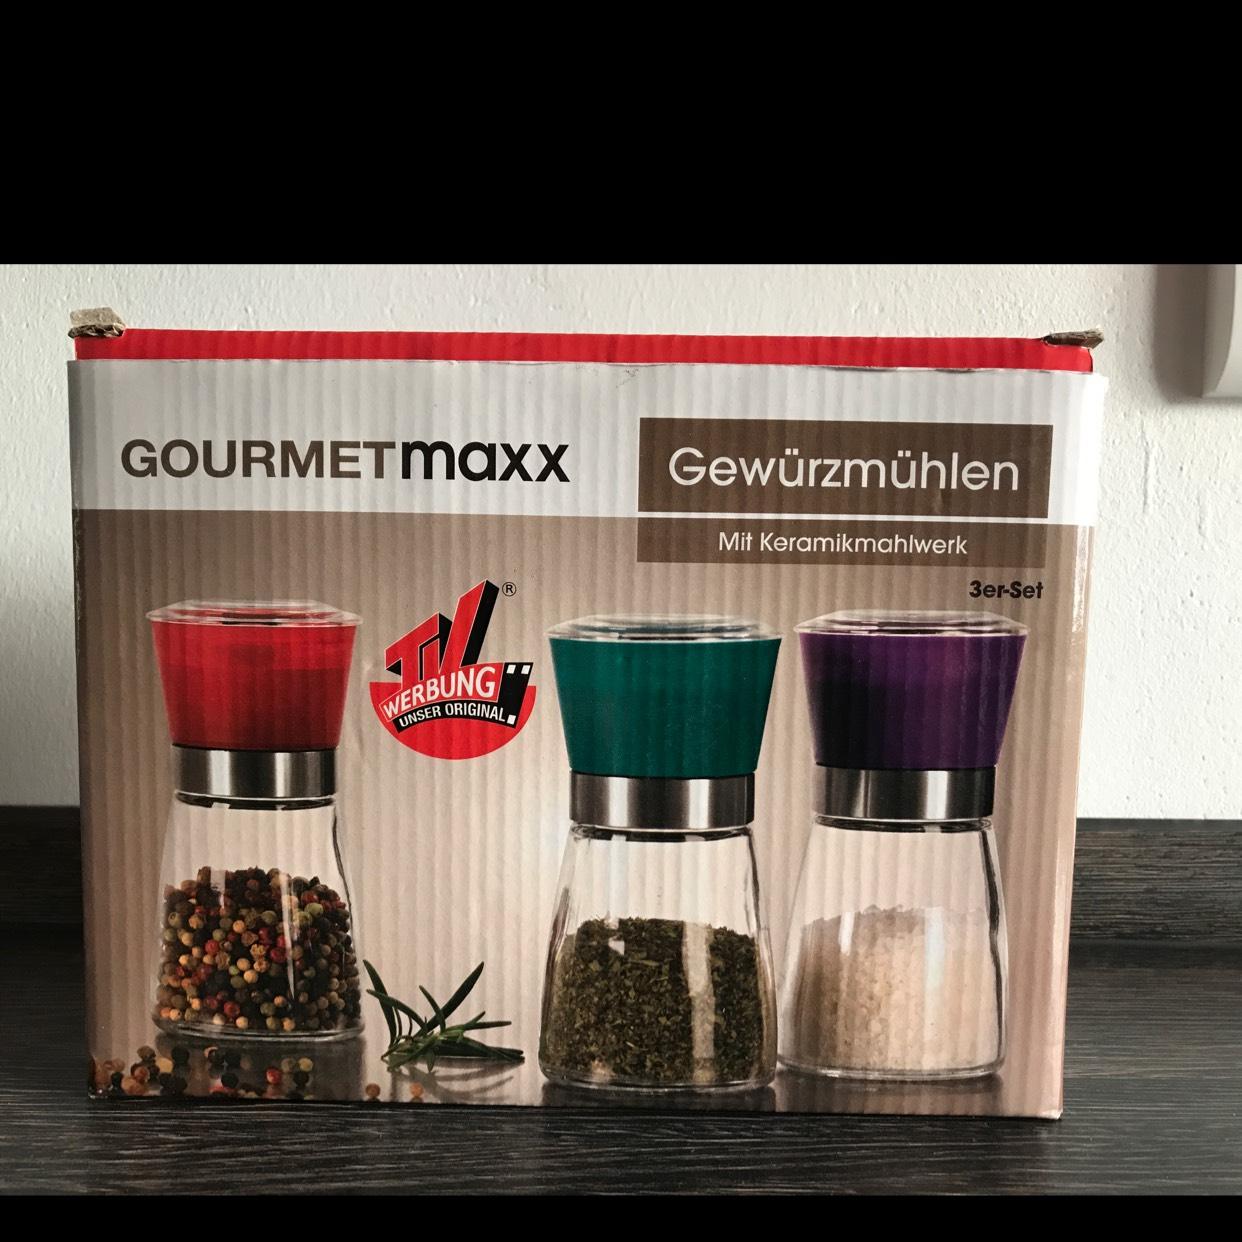 [LOKAL/LEIPZiG] KIK Gewürzmühlen Keramik GourmetMaxx 3er-Set